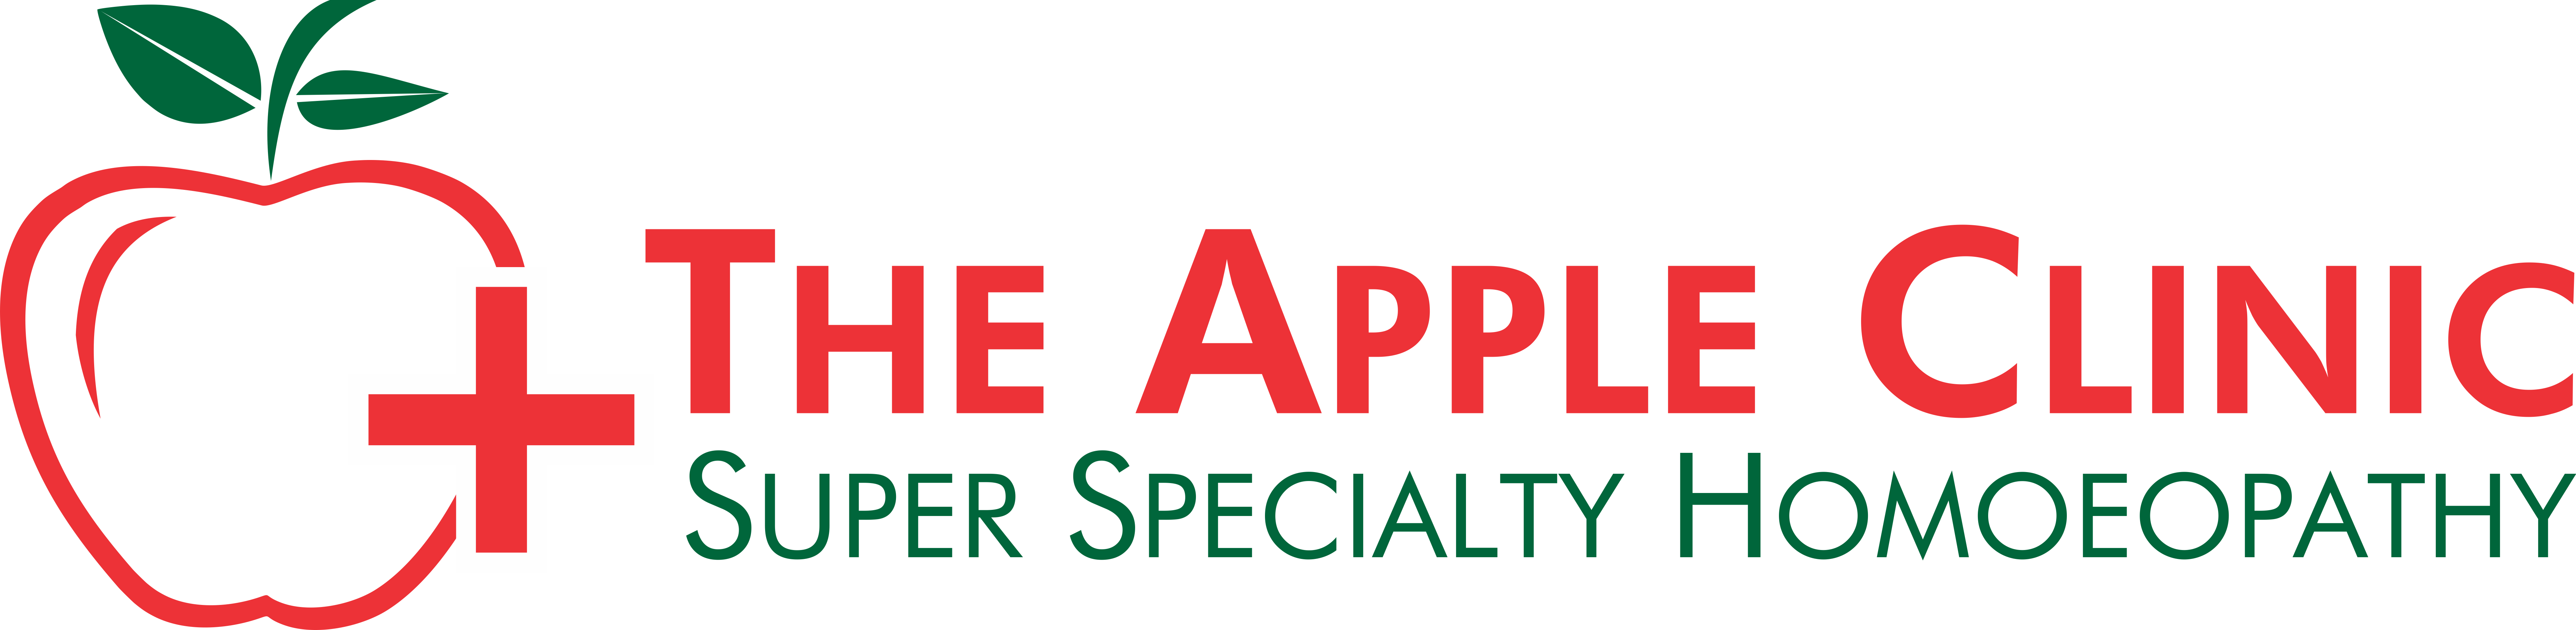 The Apple Clinic